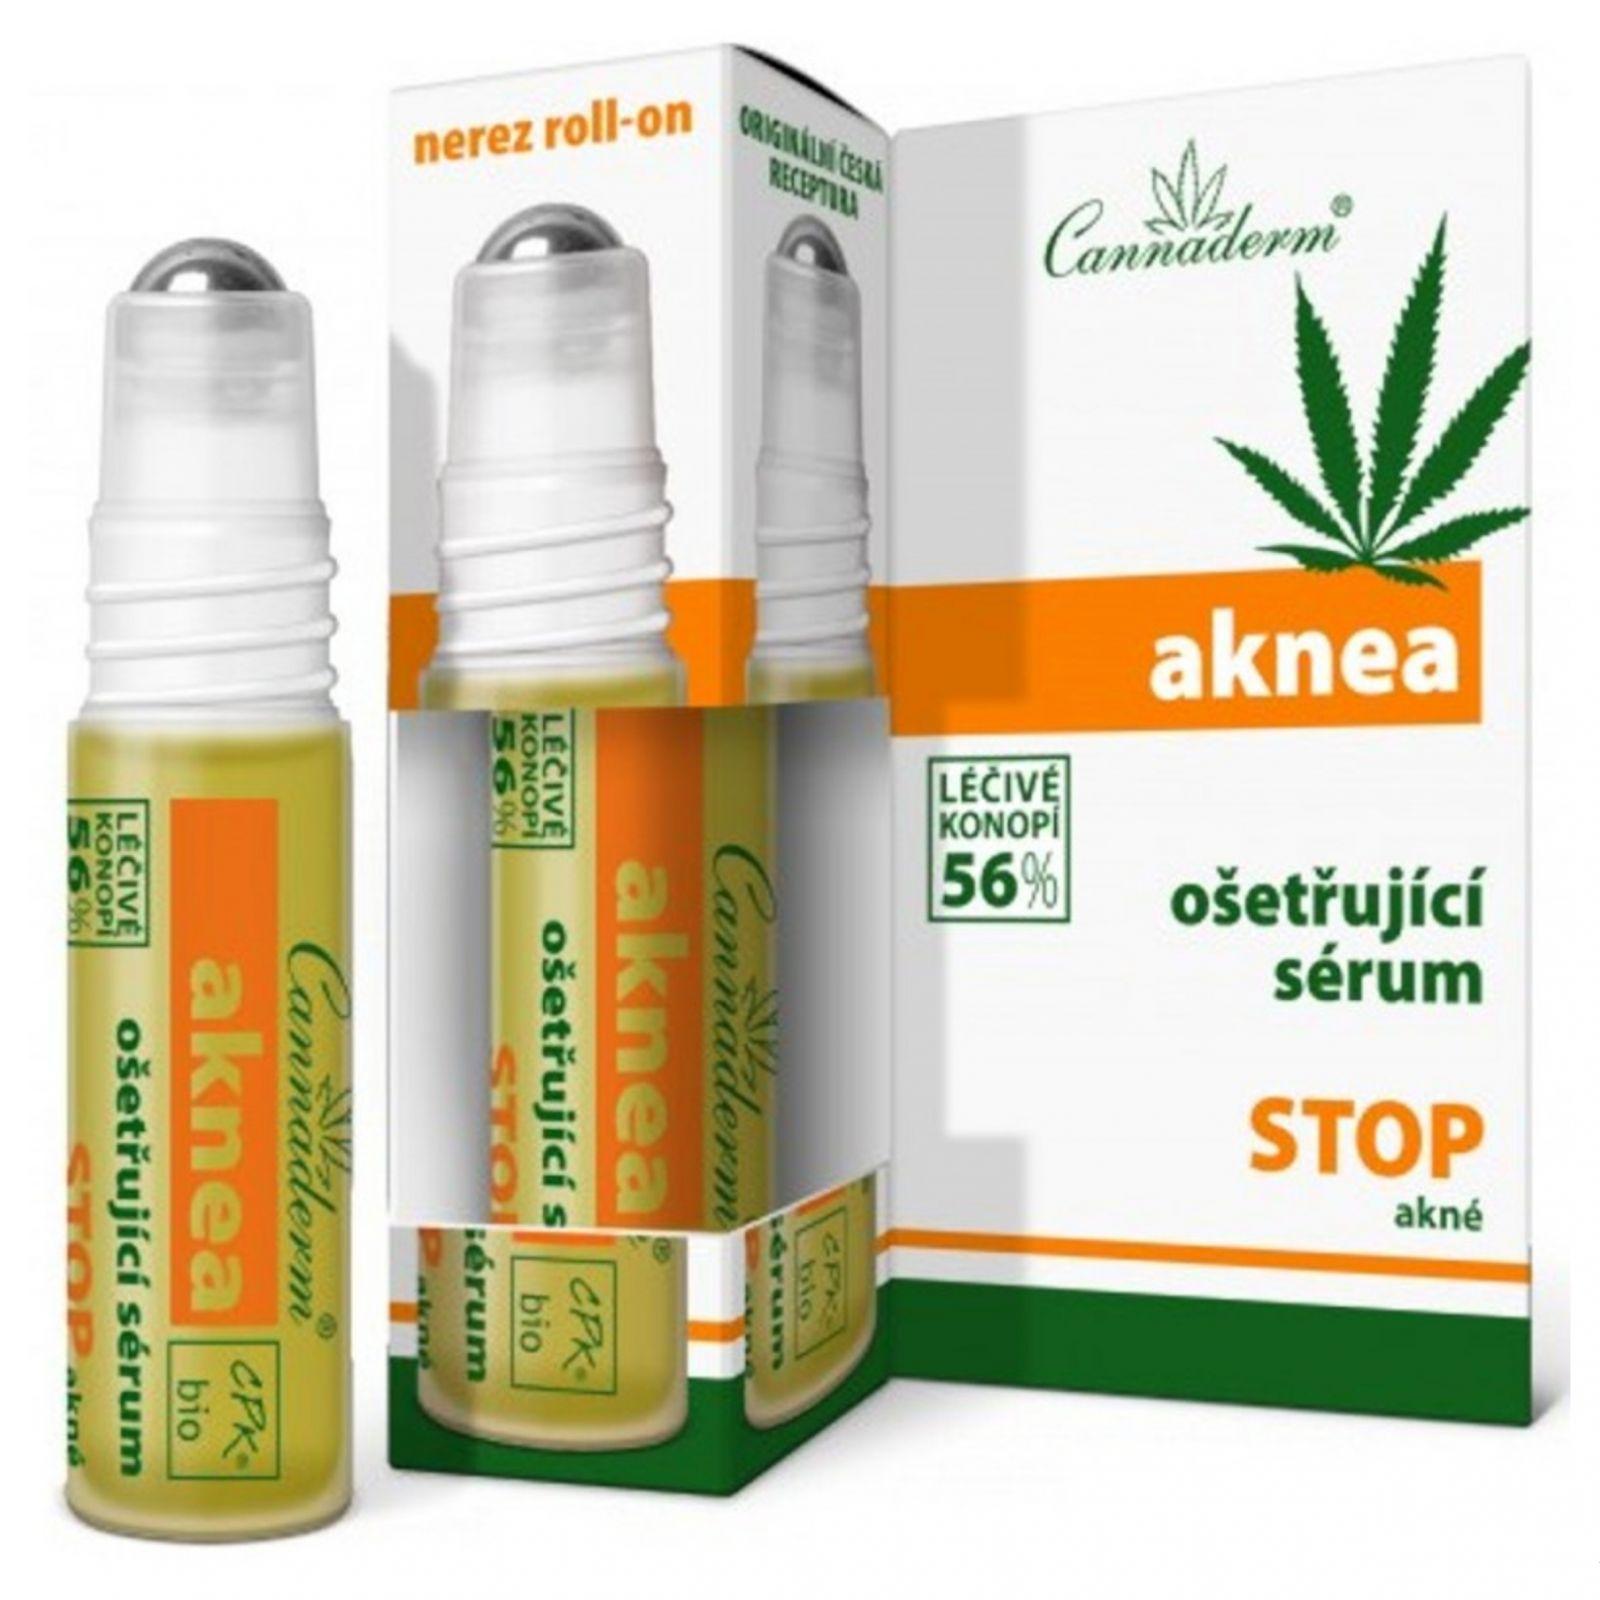 Cannaderm Aknea ošetřující sérum při akné 5 ml